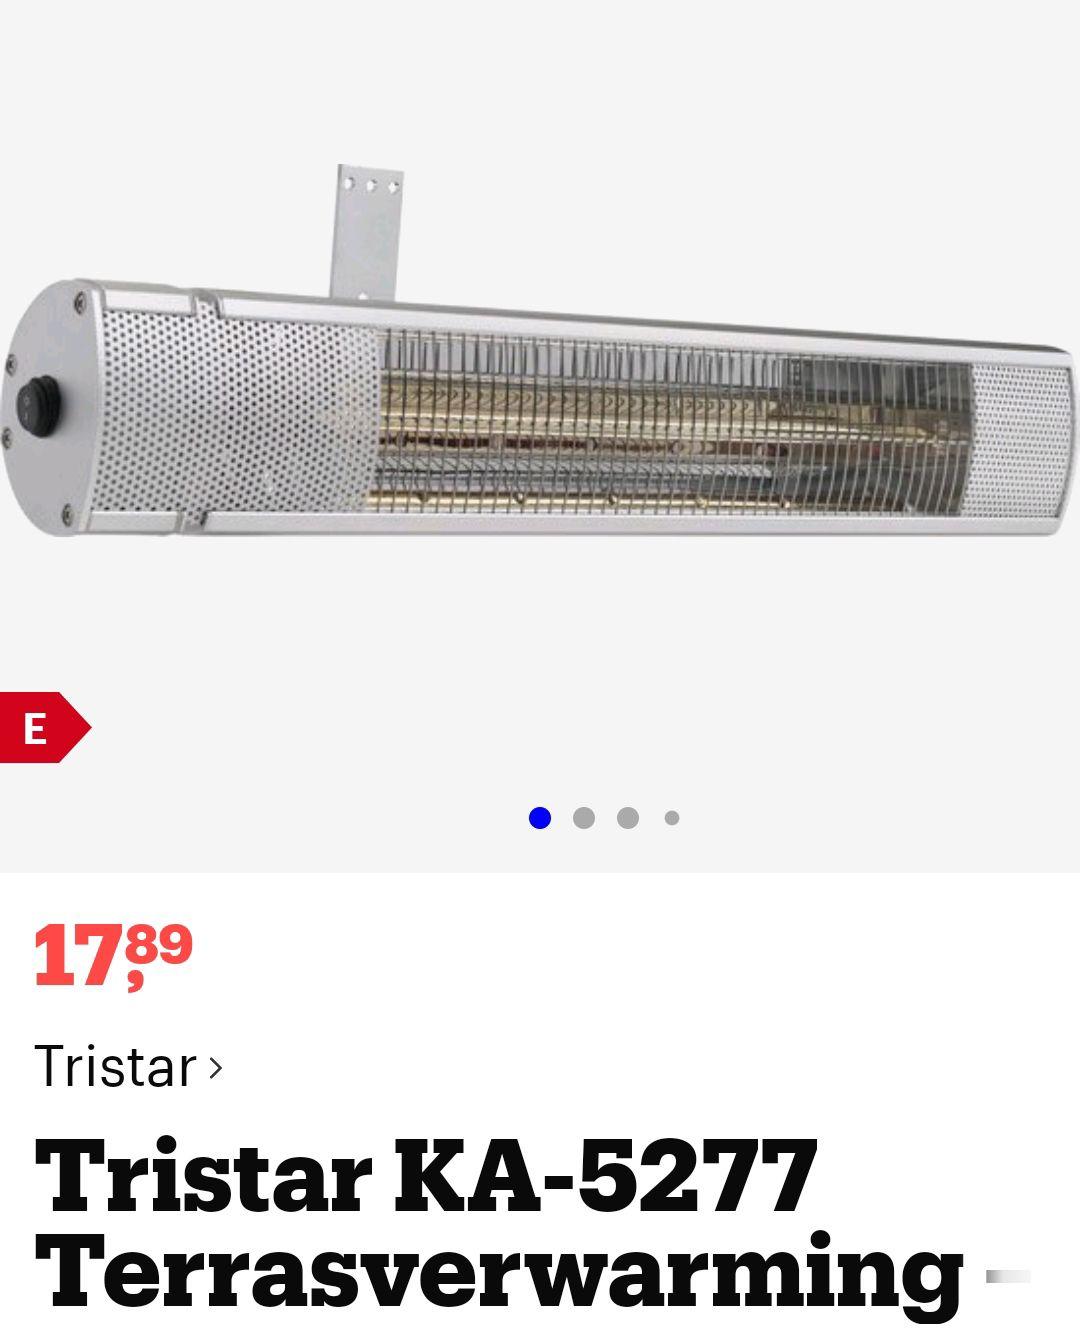 Terrasverwarming Tristar 2000 watt